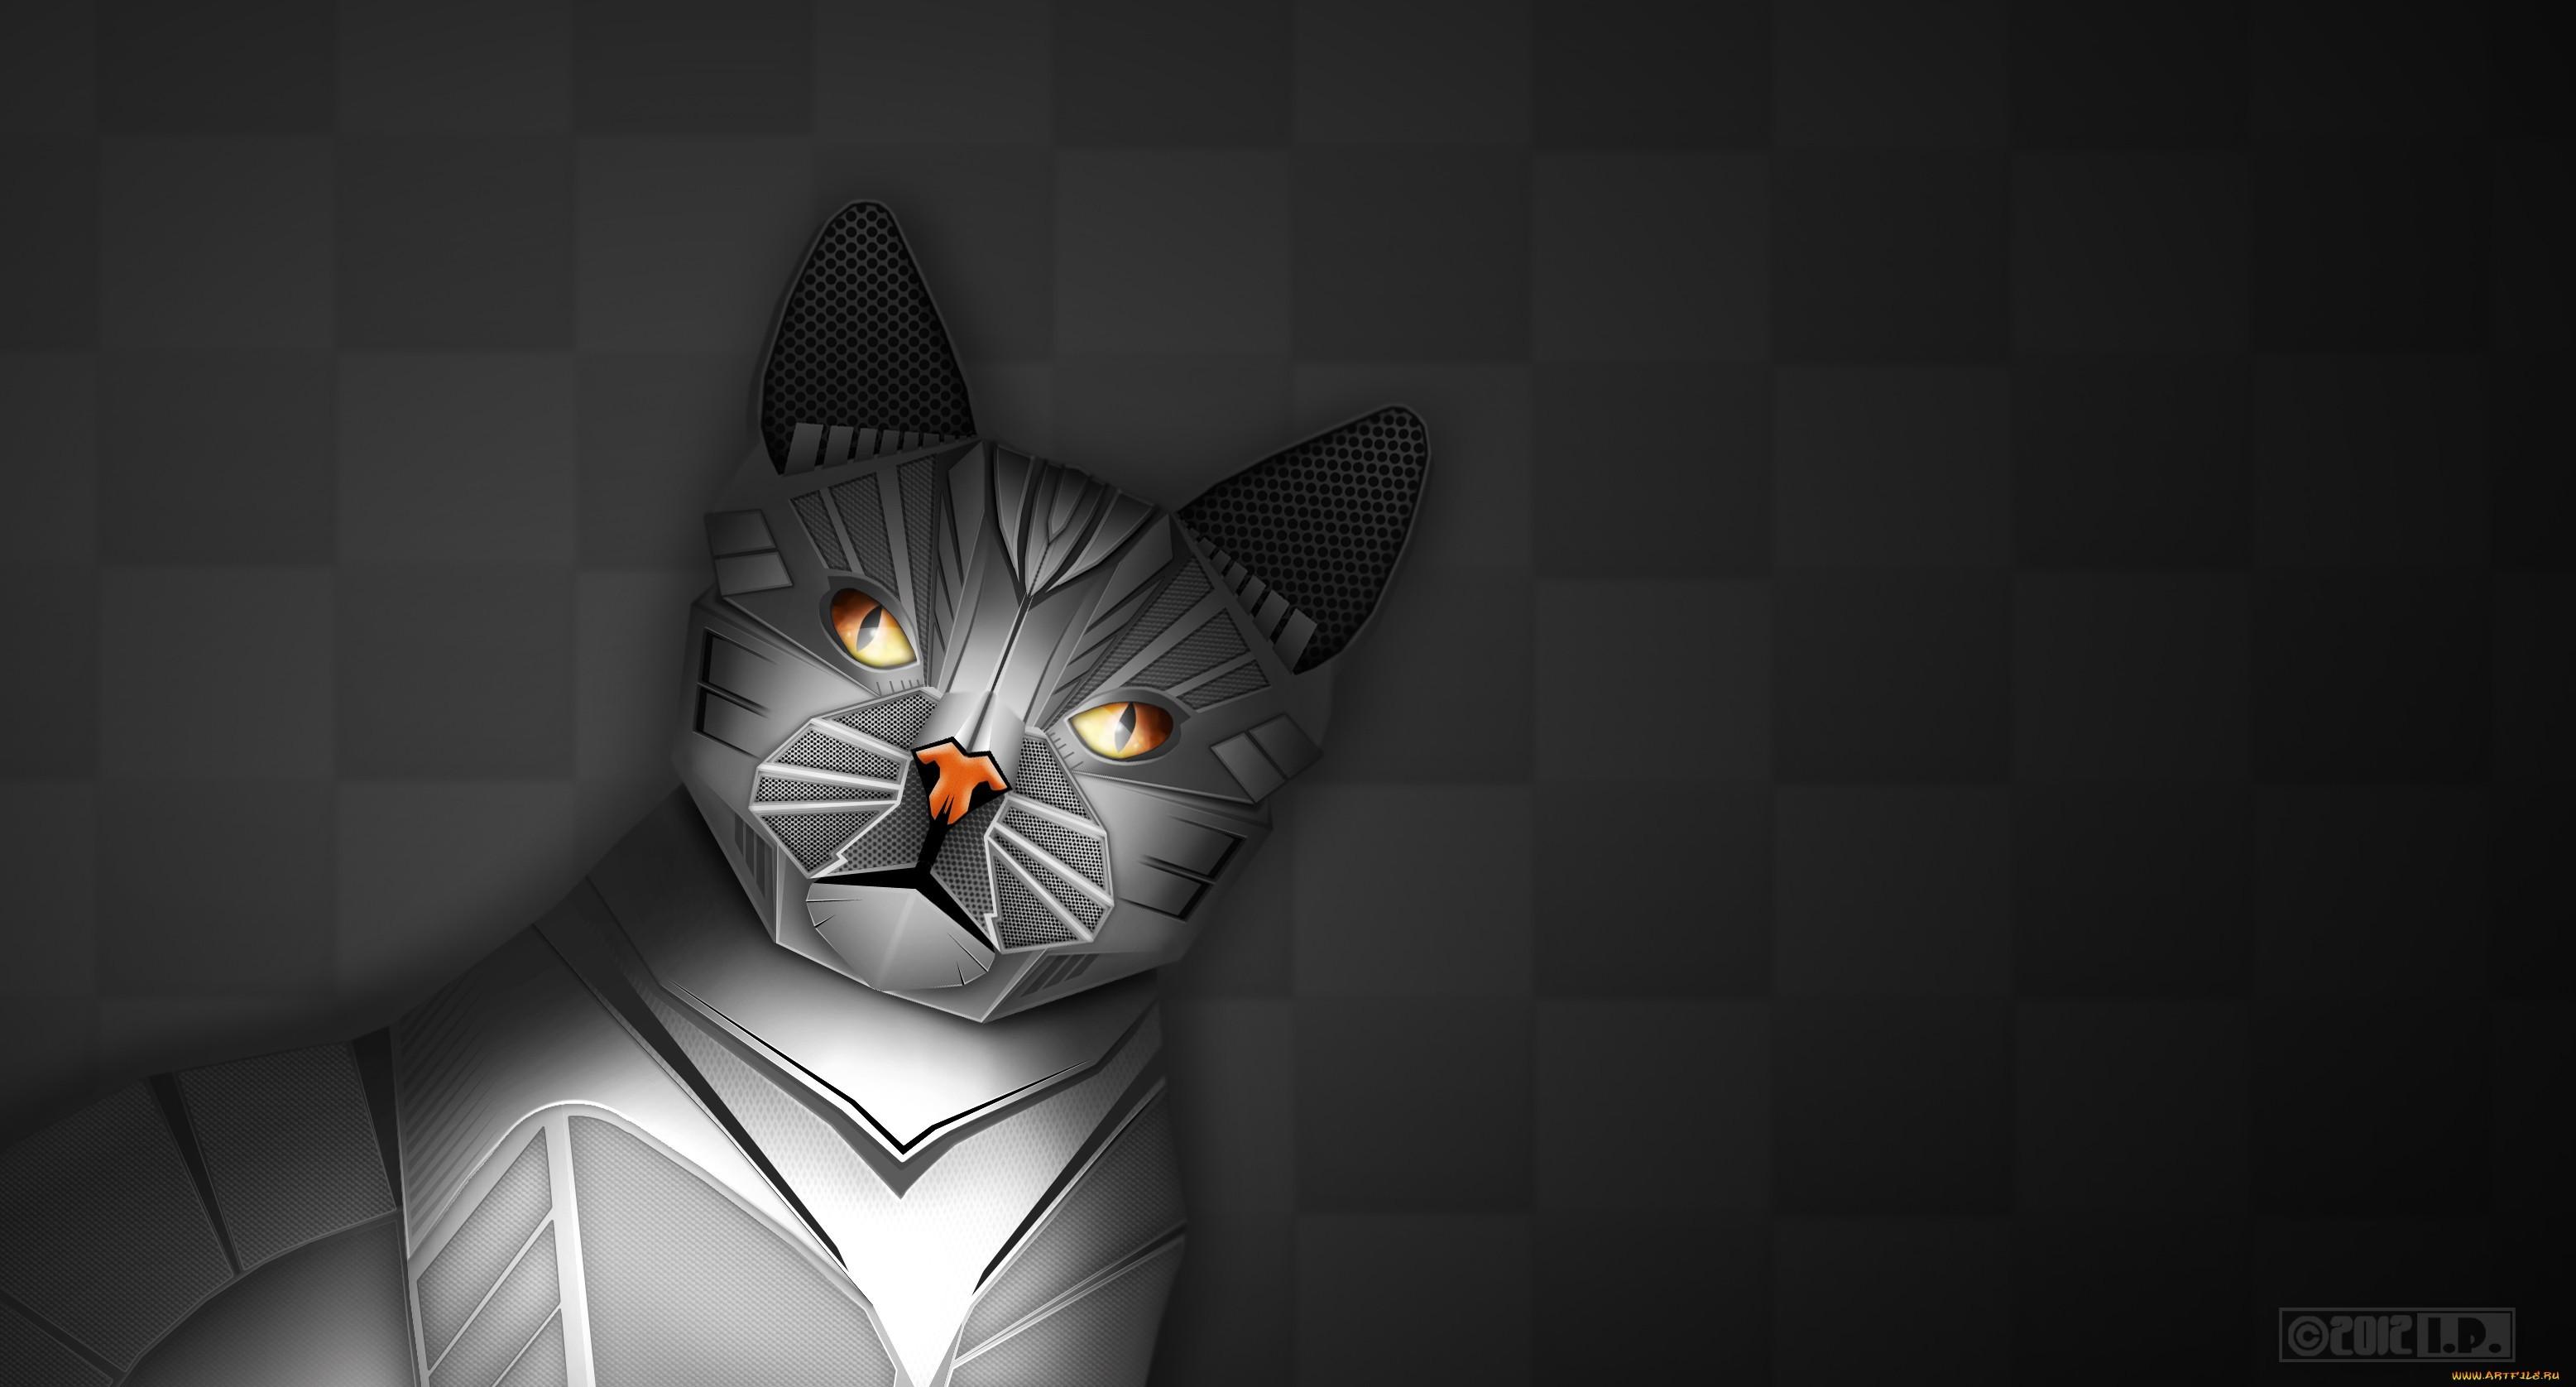 catbox.moe,图片外链测试